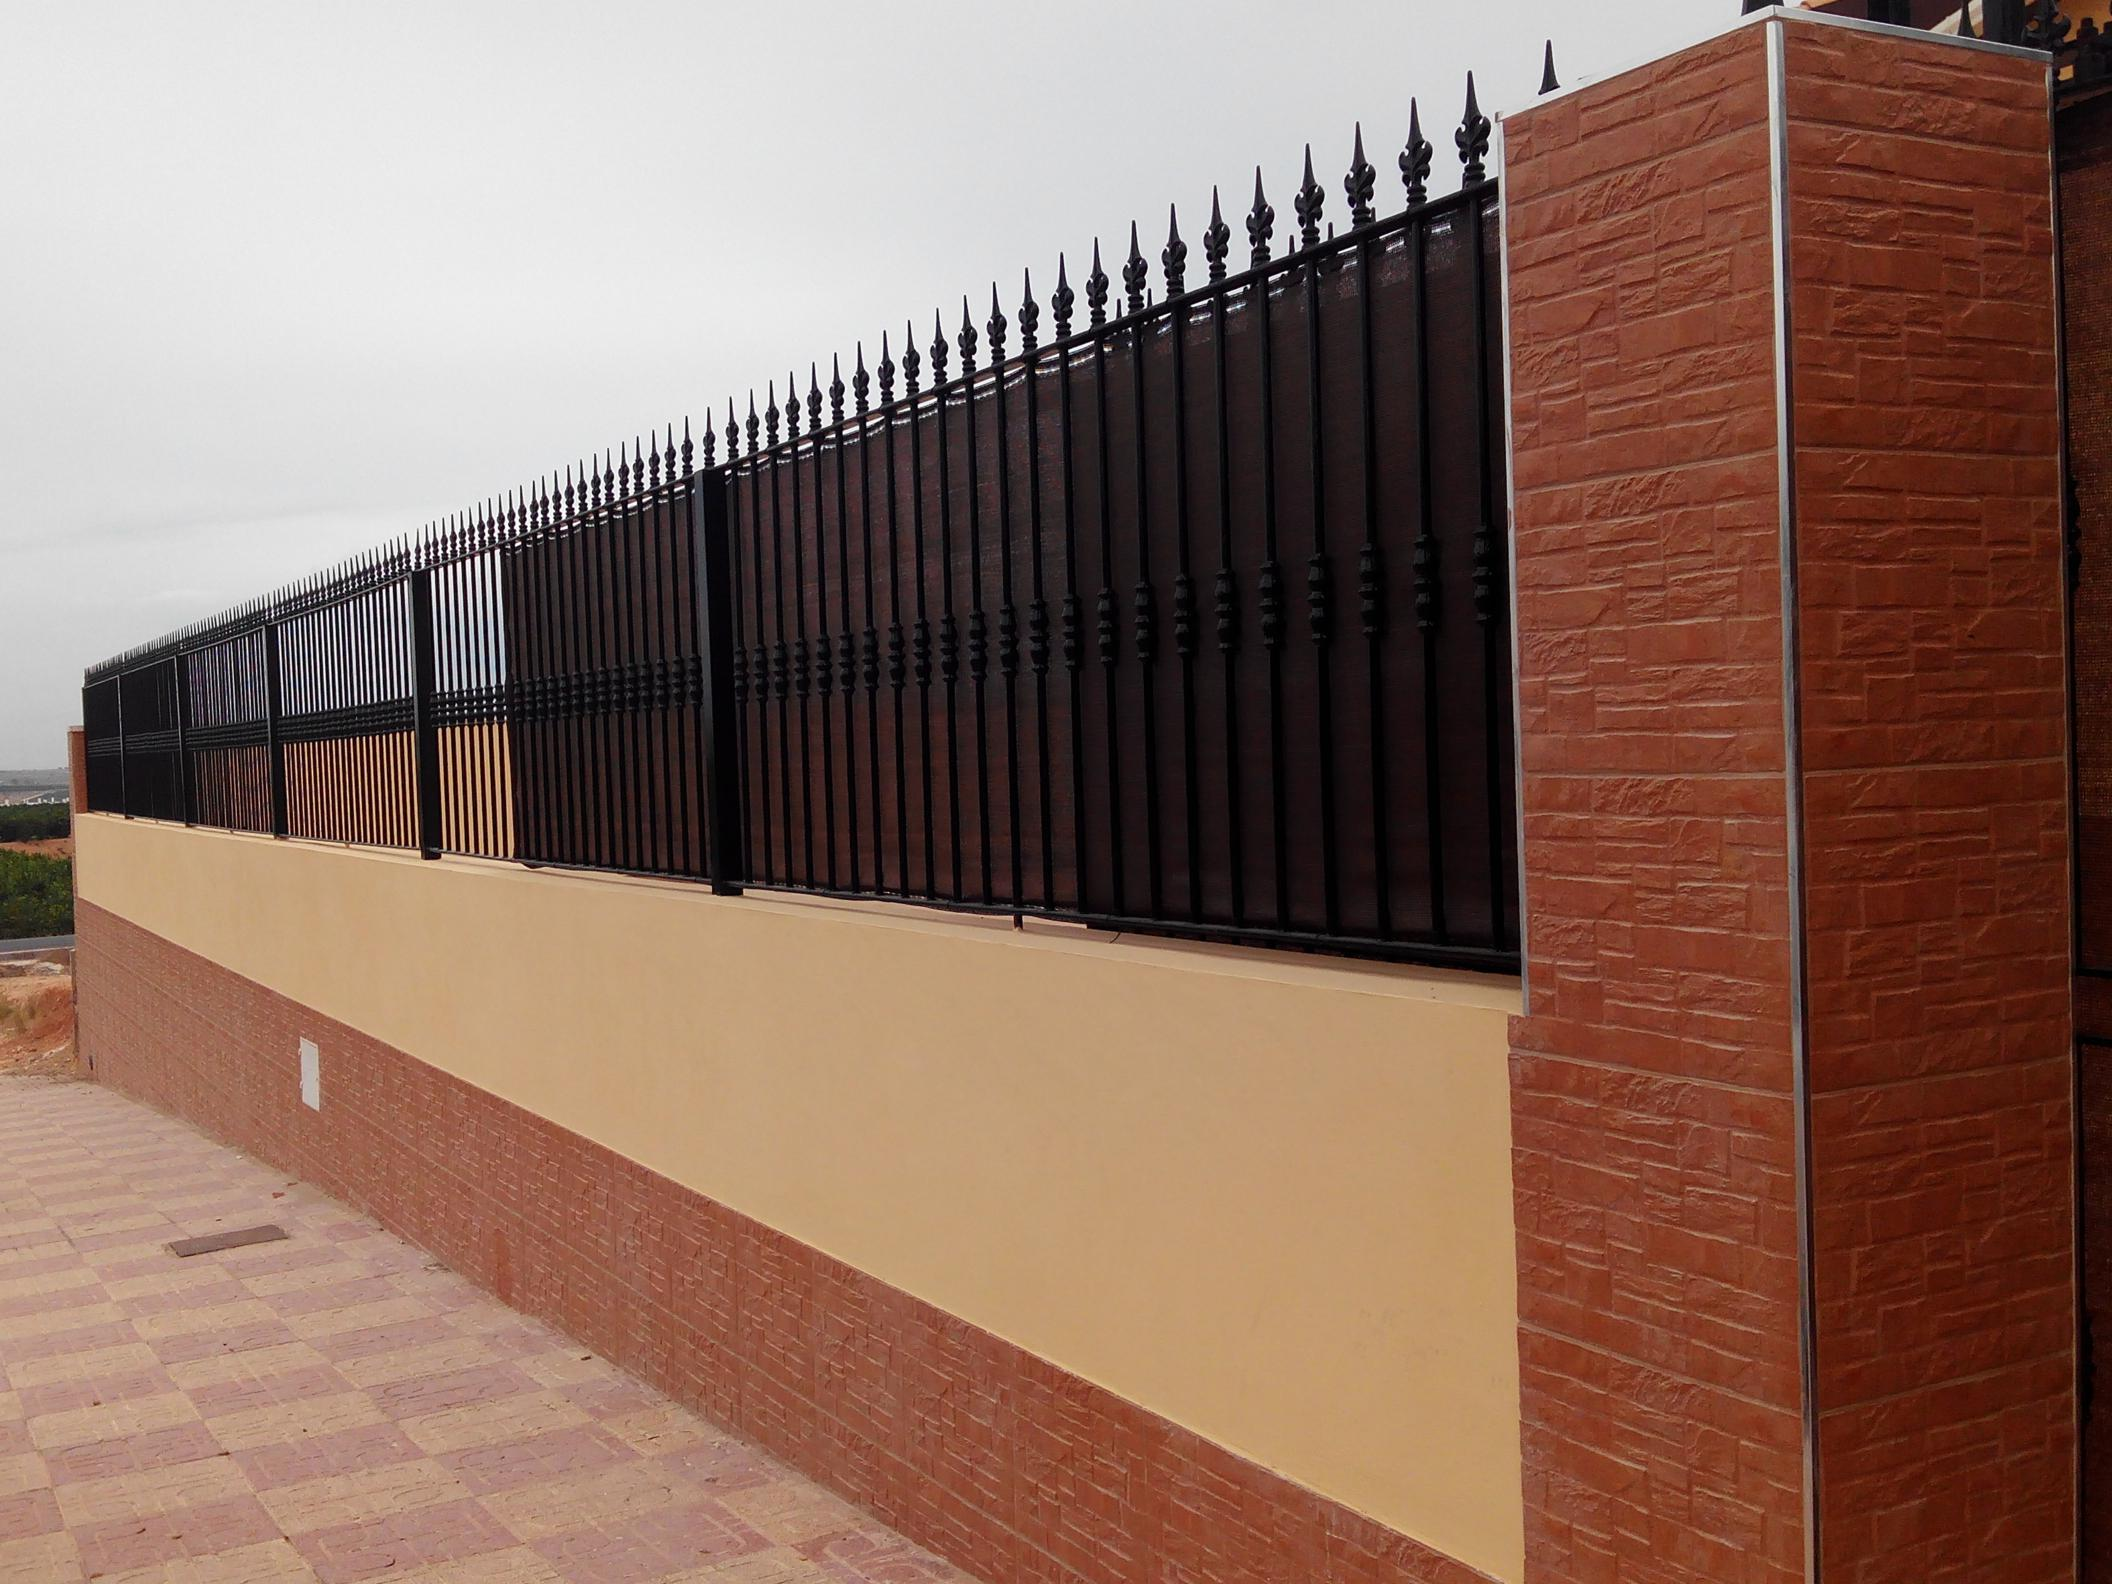 rehabilitacion de fachada en torrevieja orihuela guardamar del segura